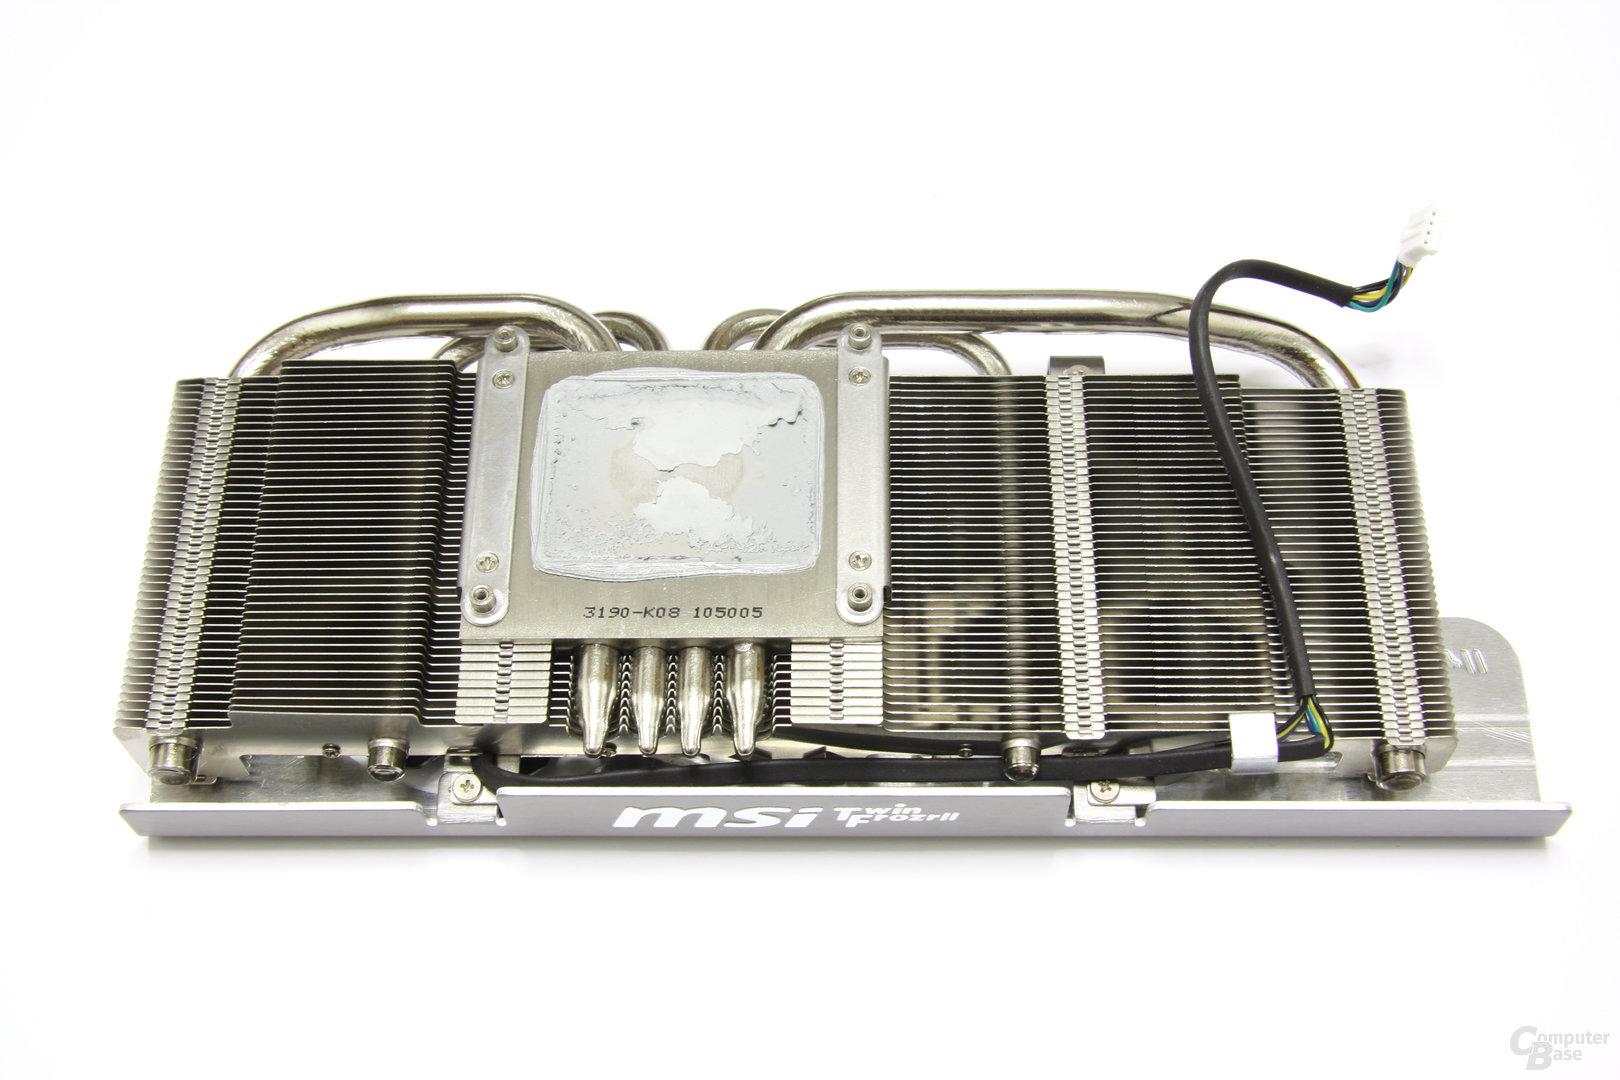 GeForce GTX 560 Ti TFII OC Kühlerrückseite